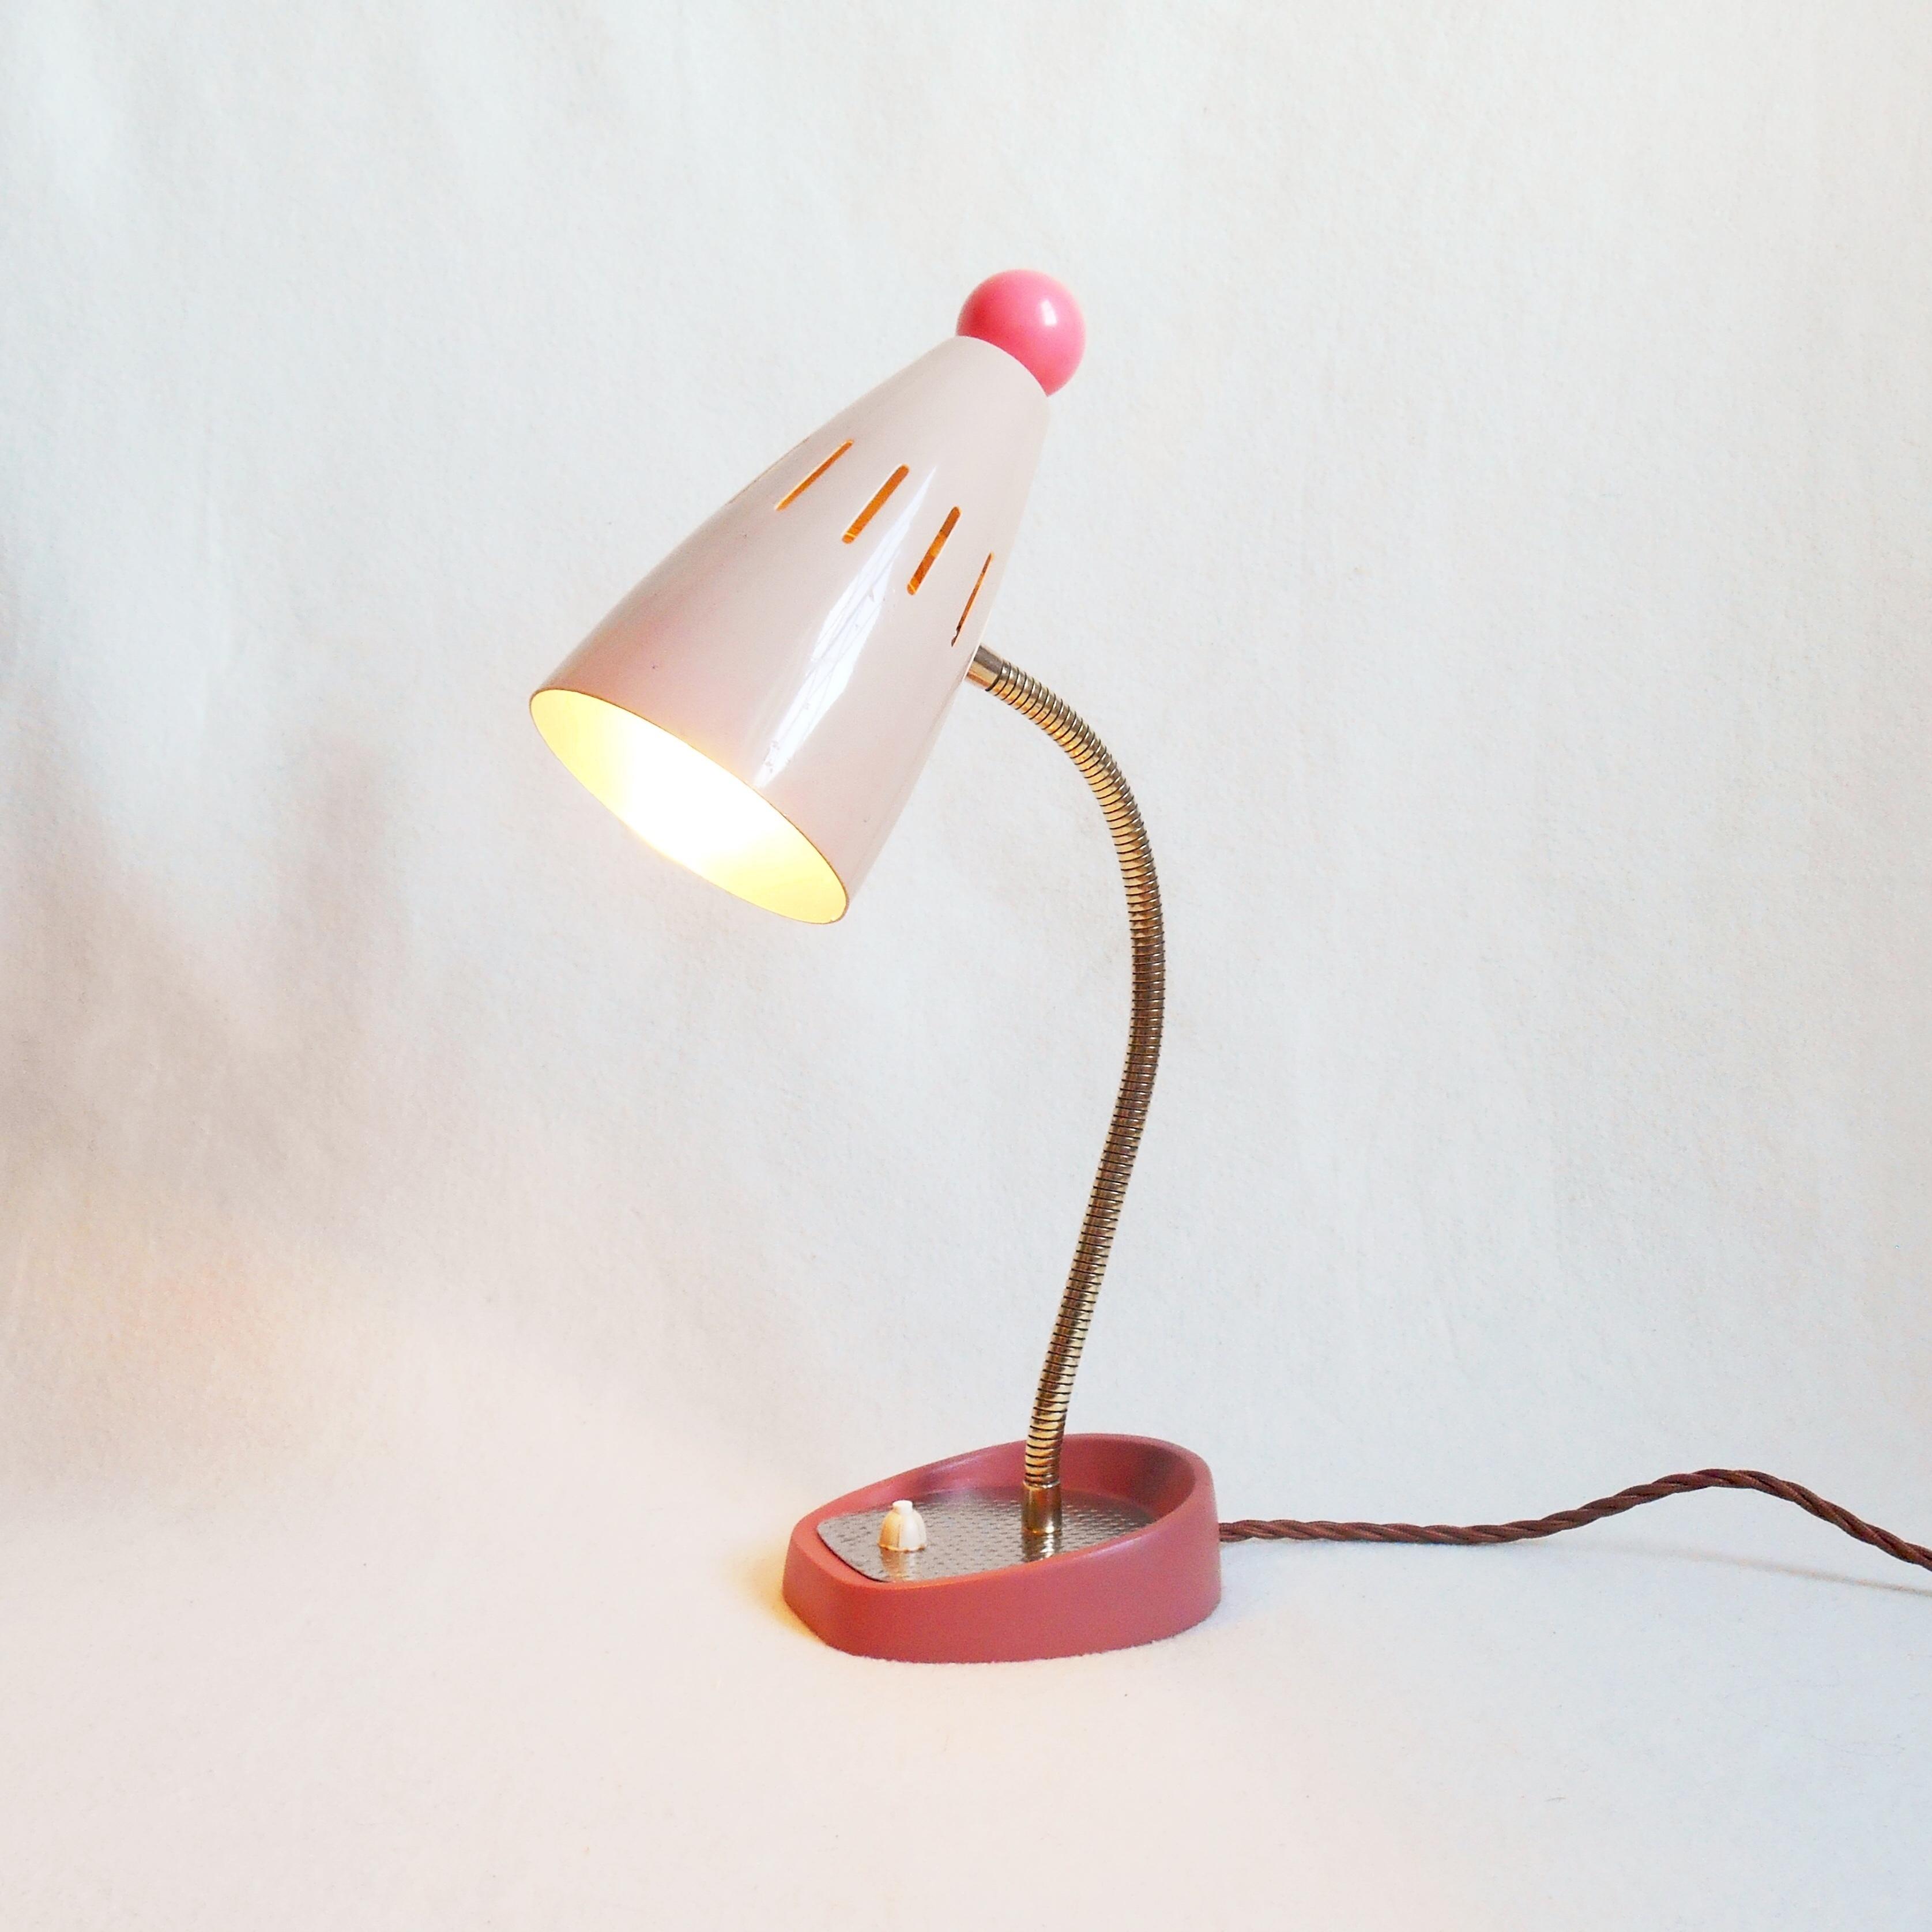 Image of: A Vintage Mid Century Desk Lamp Vinterior